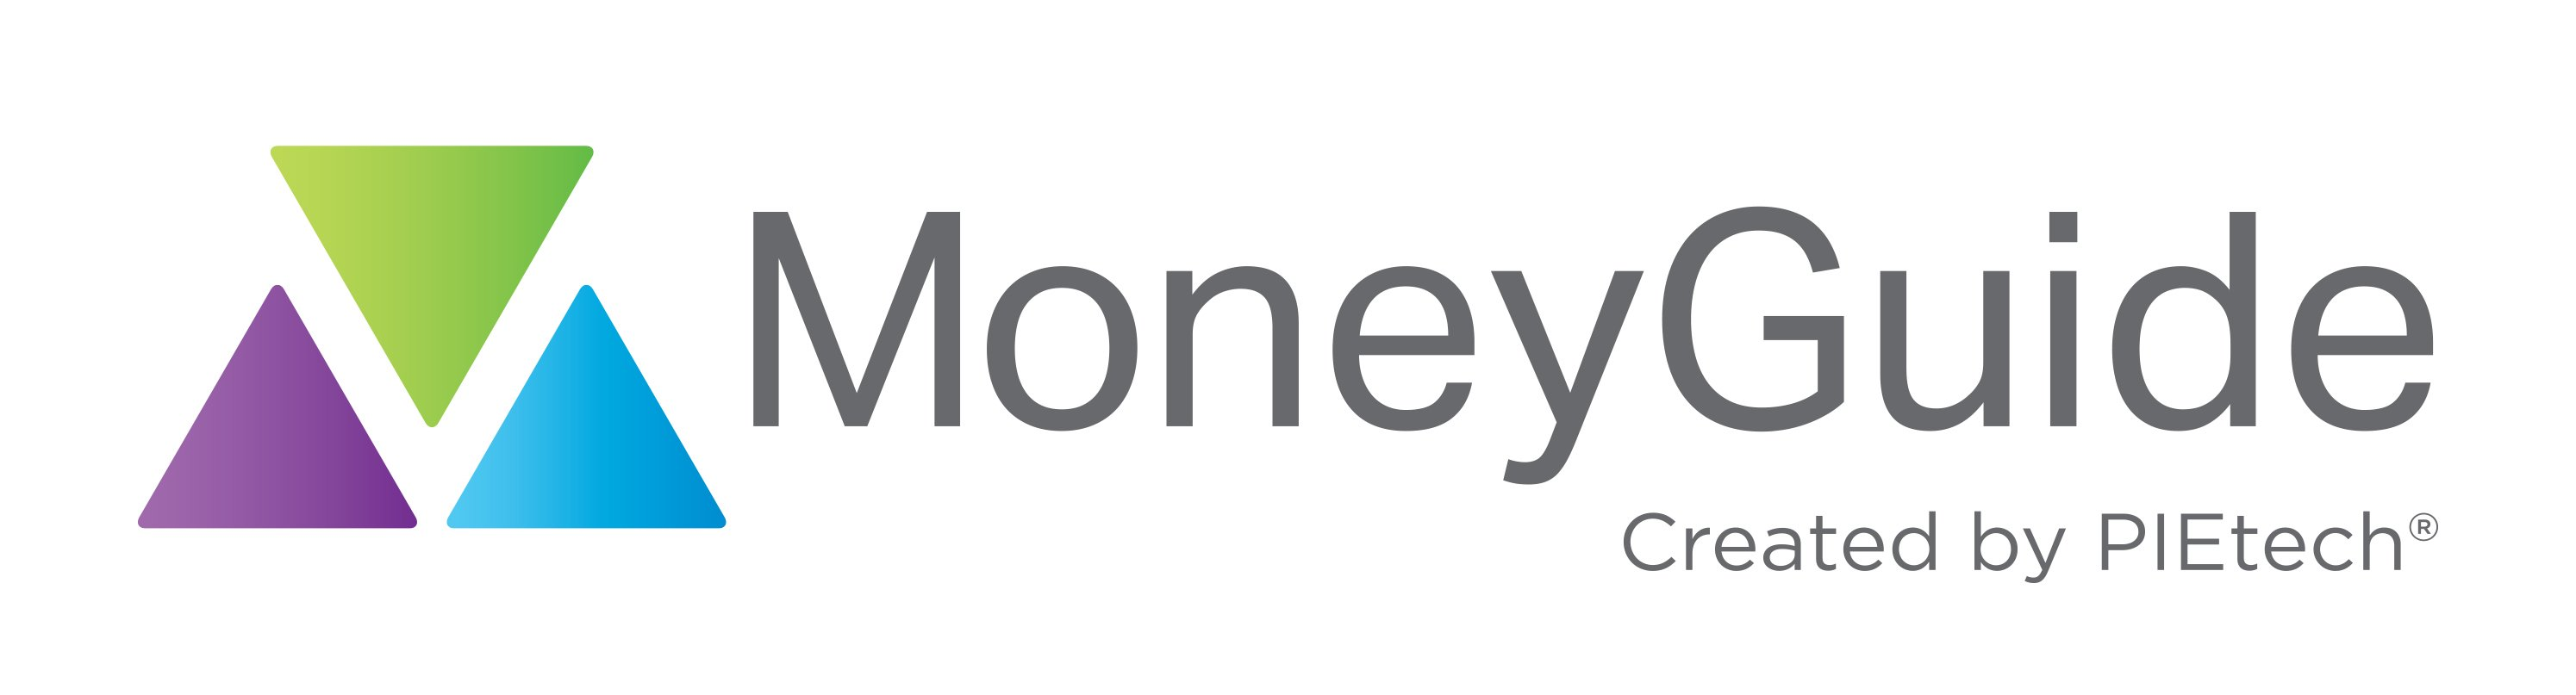 MoneyGuidePro